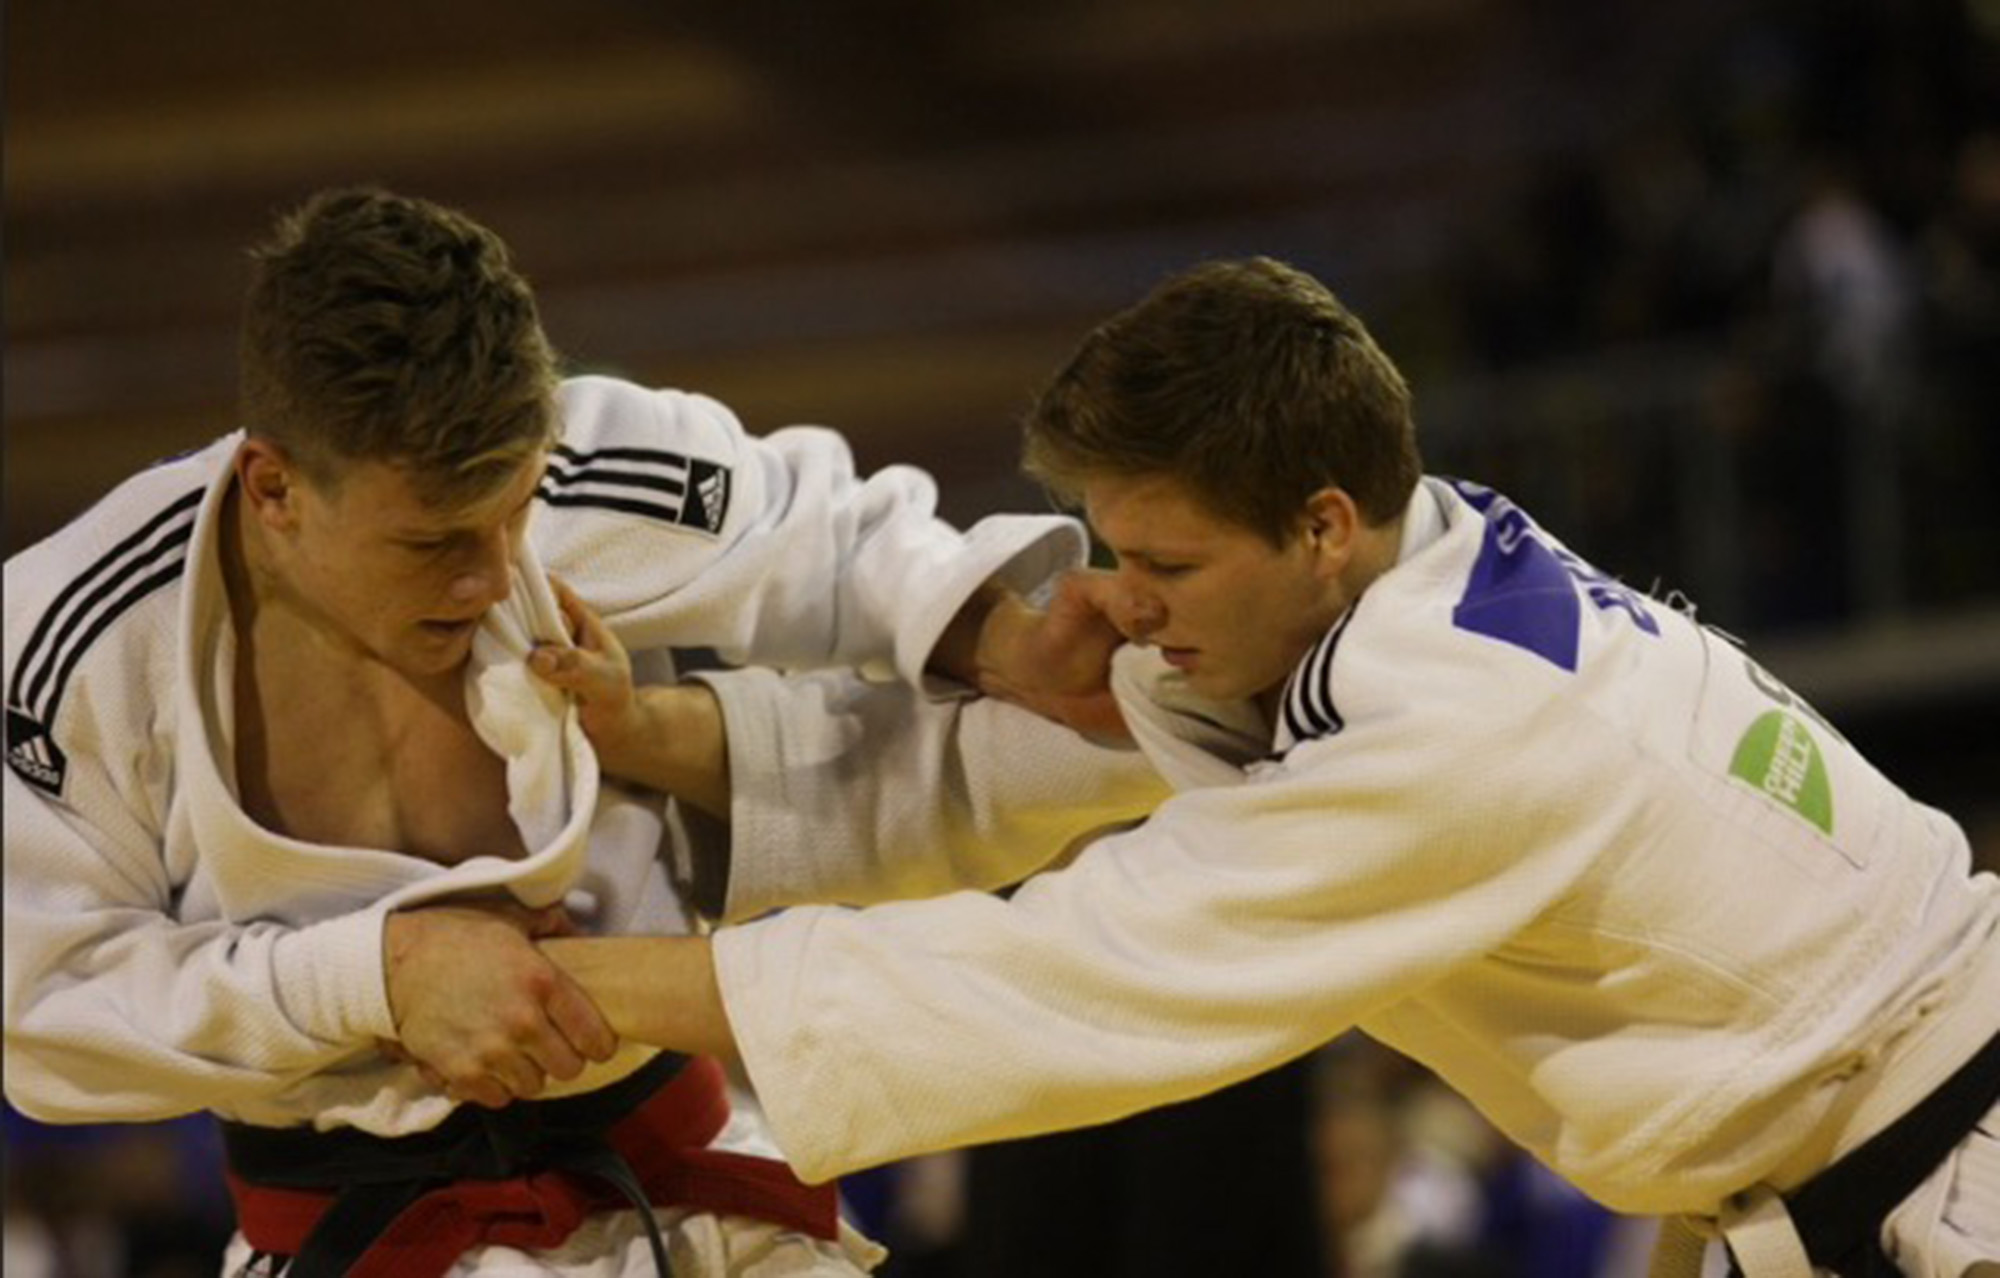 Mauk Moerman-judoka judo topsport